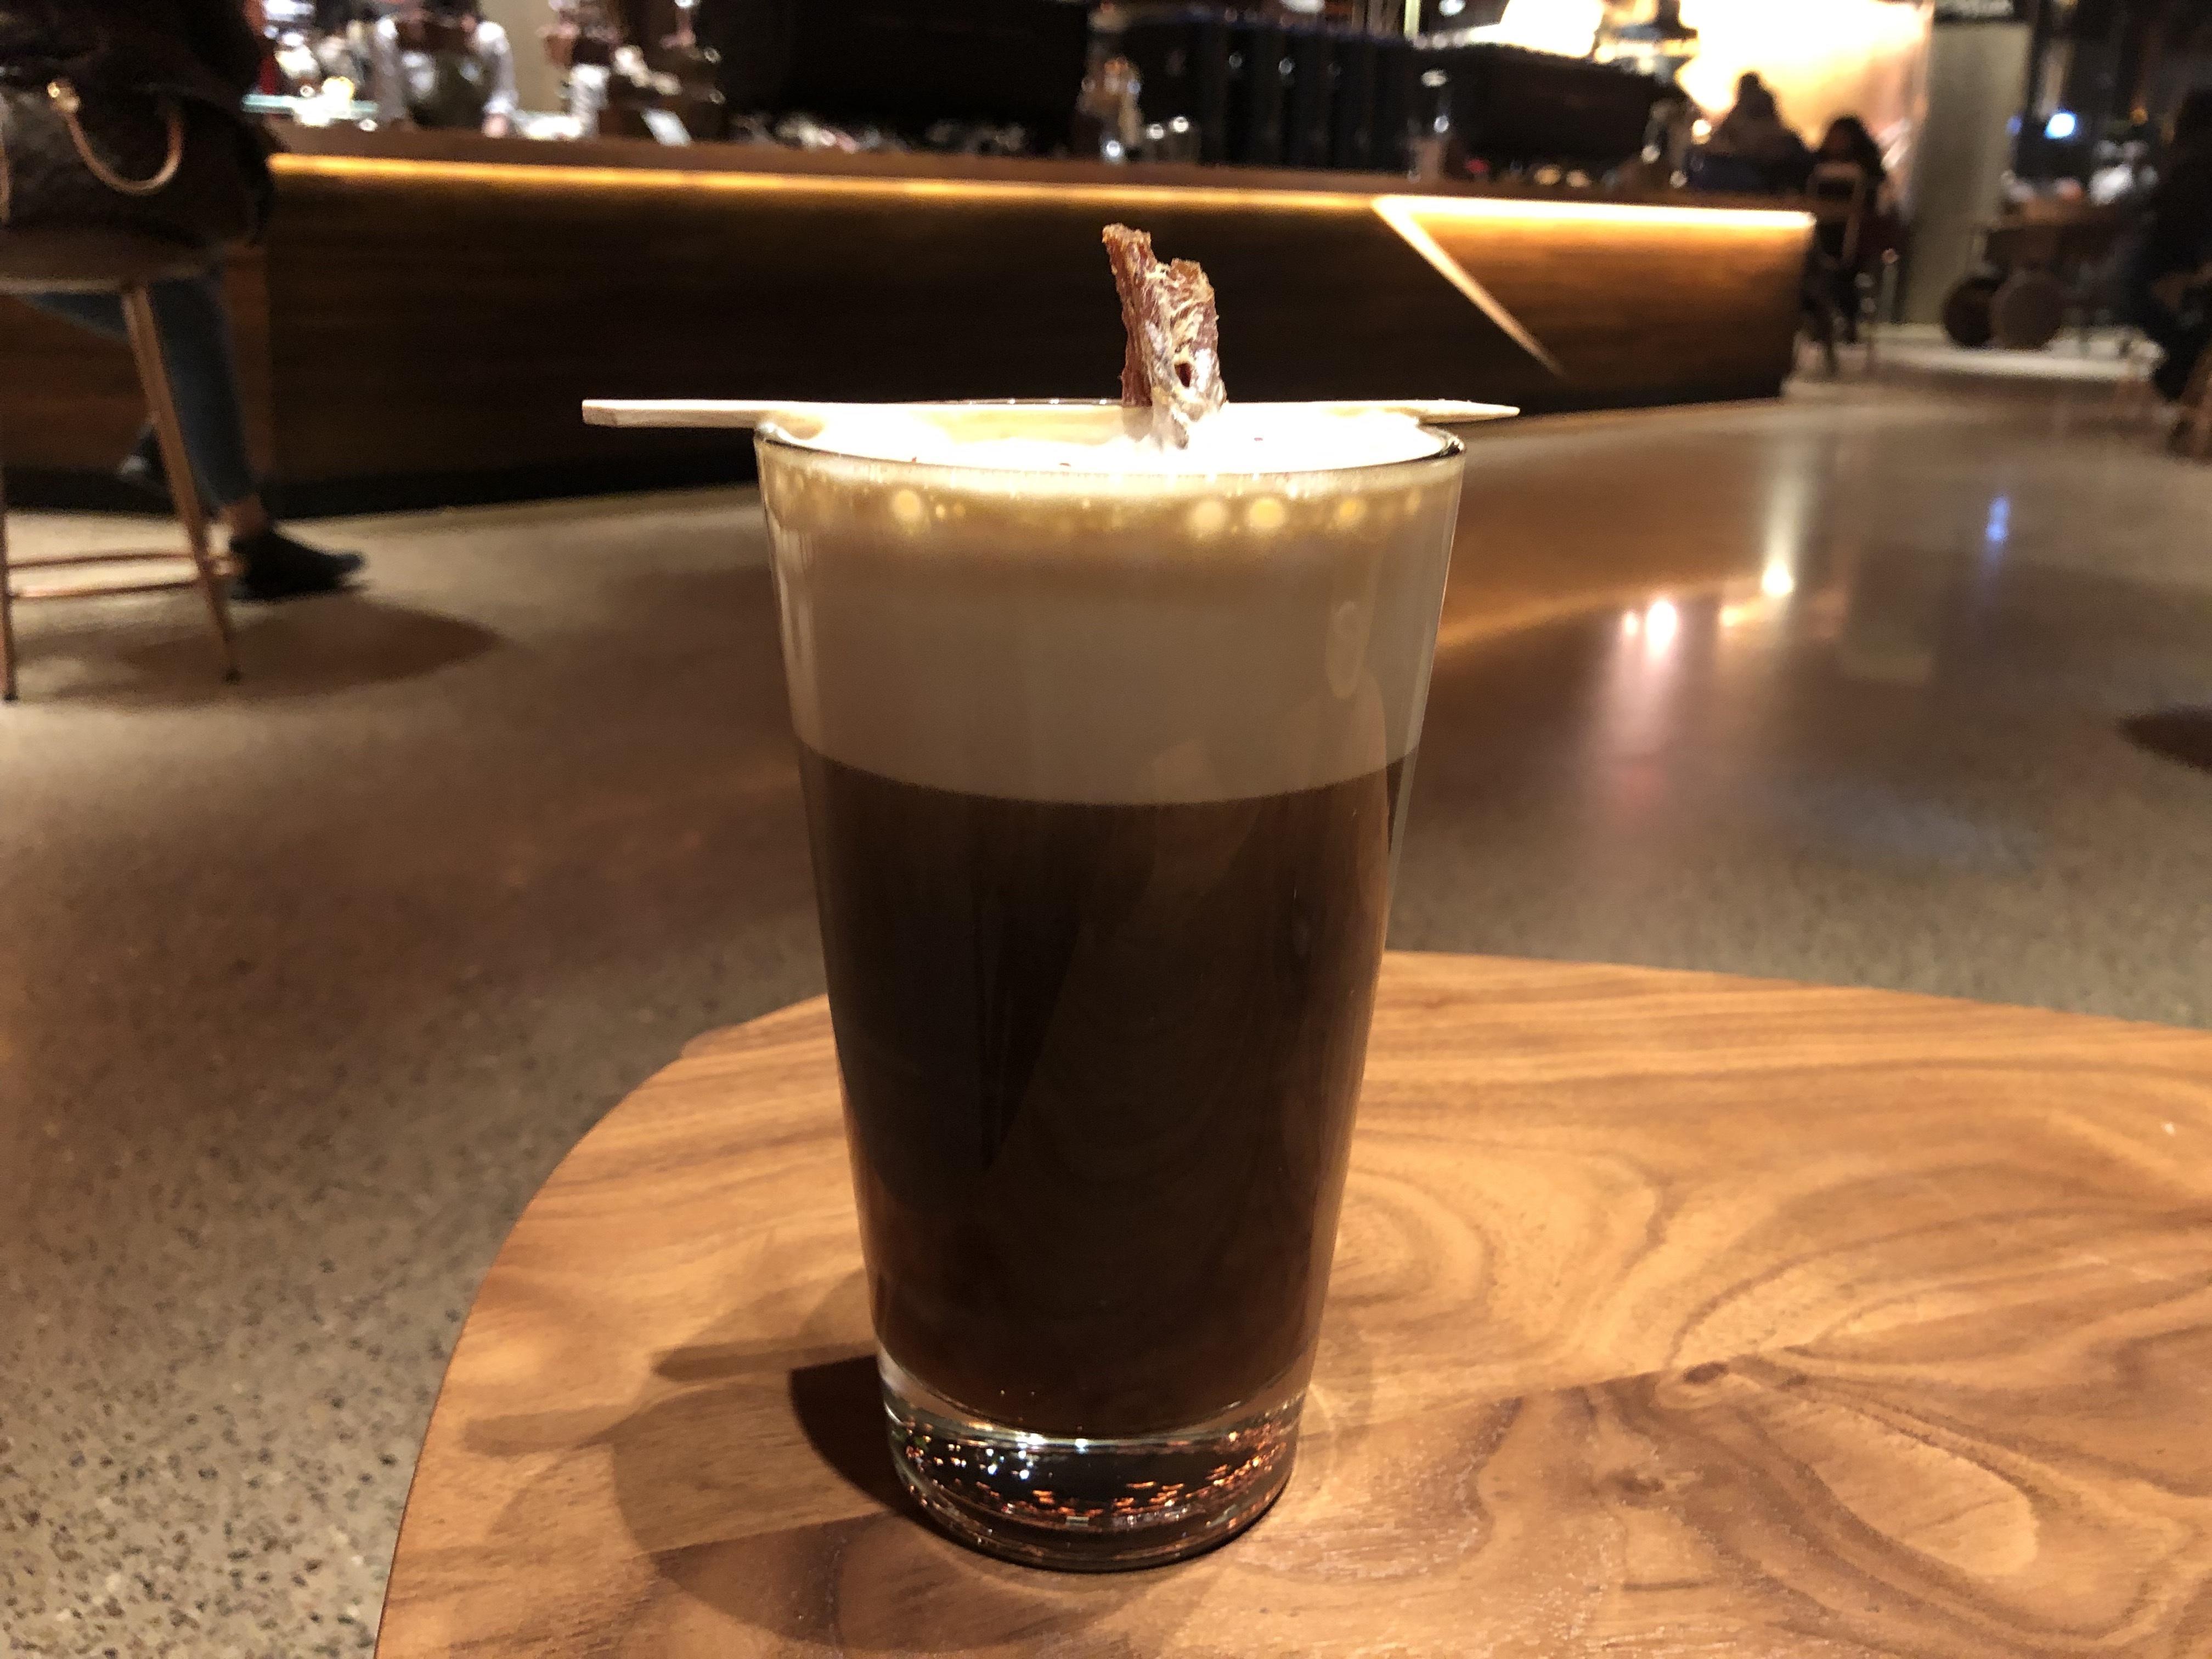 Starbucks's Massive New Chelsea Roastery Is a Coffee Theme Park Apocalypse